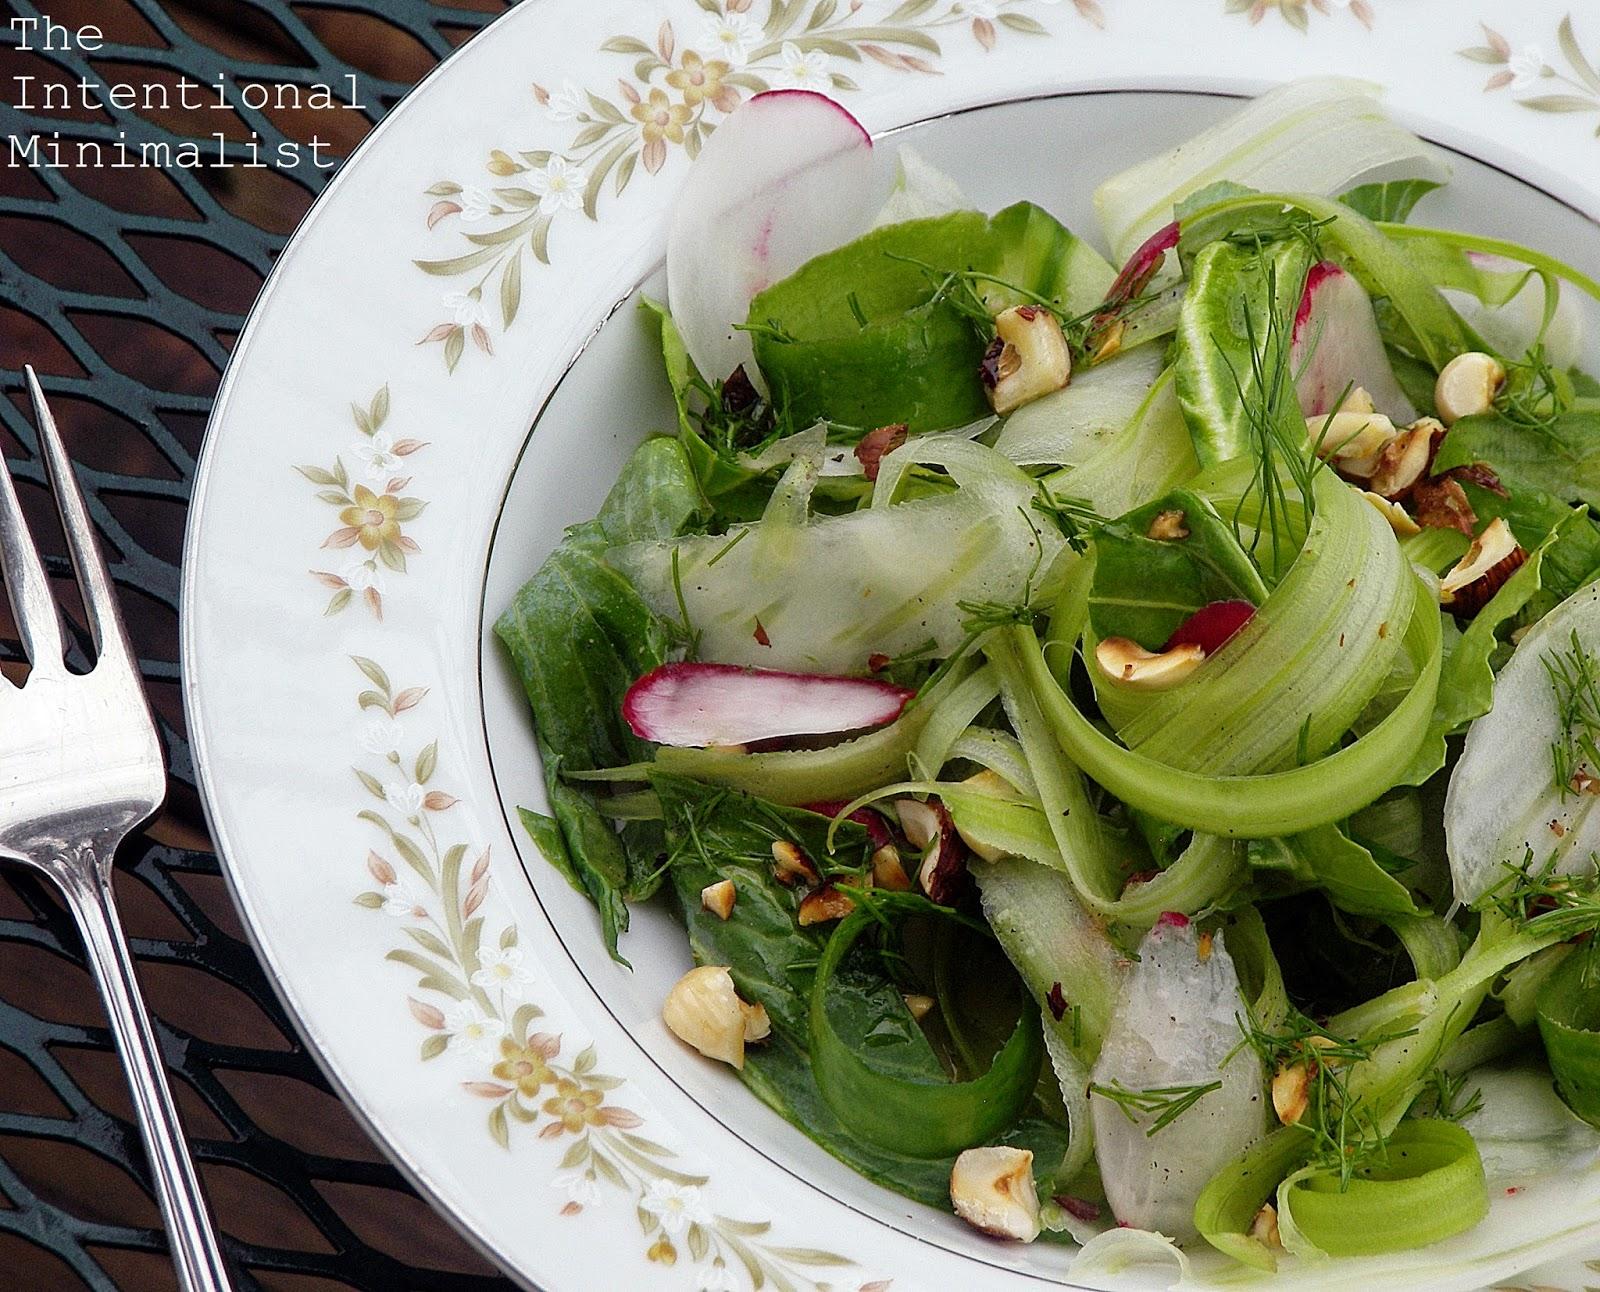 Fennel+and+White+Swiss+Chard+Salad+with+Hazelnut+Fennel+Dressing.JPG ...